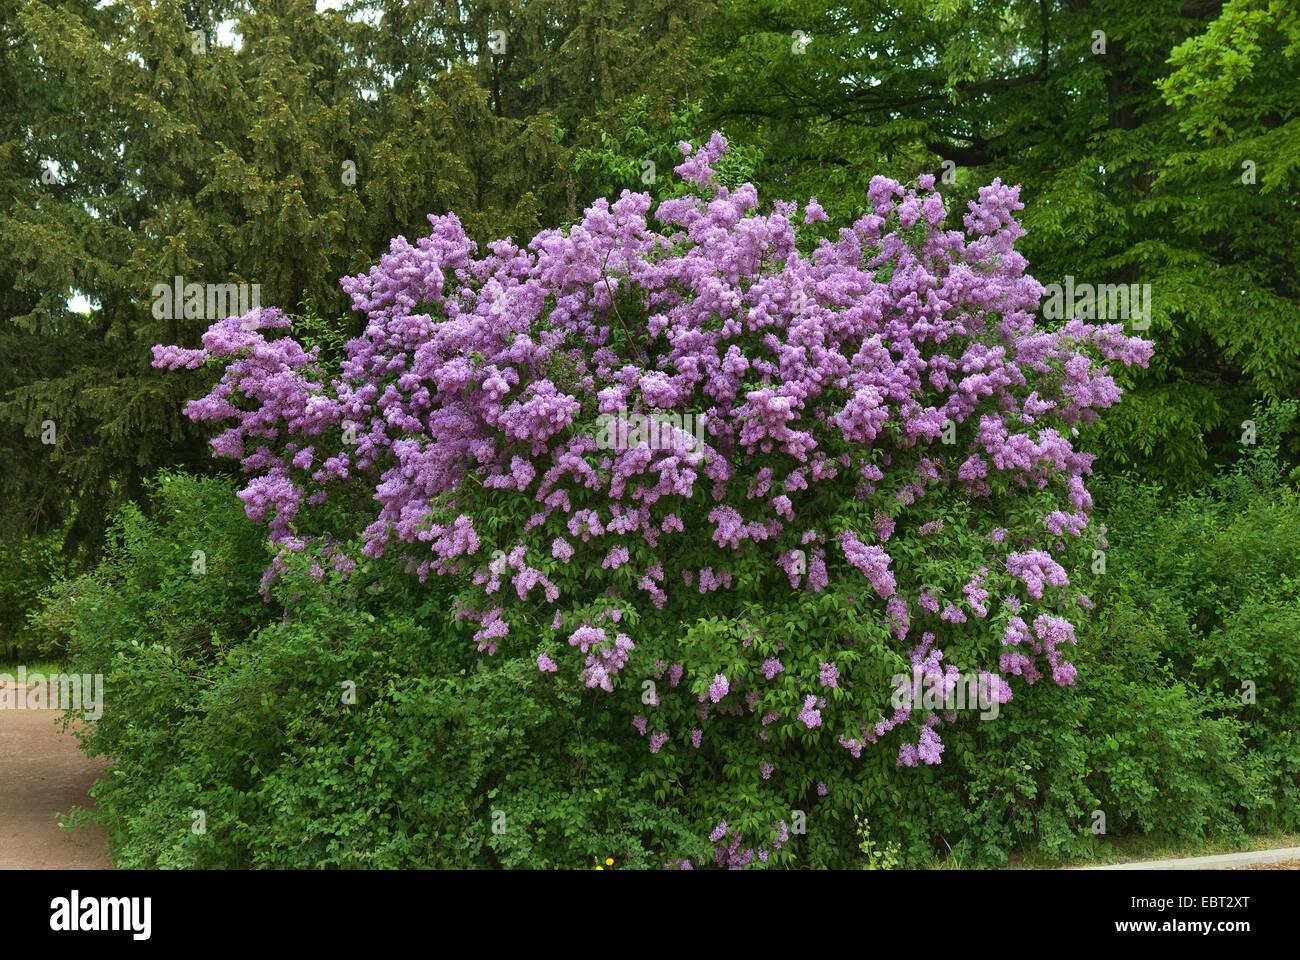 Chinese lilac (Syringa chinensis), blooming - Stock Image